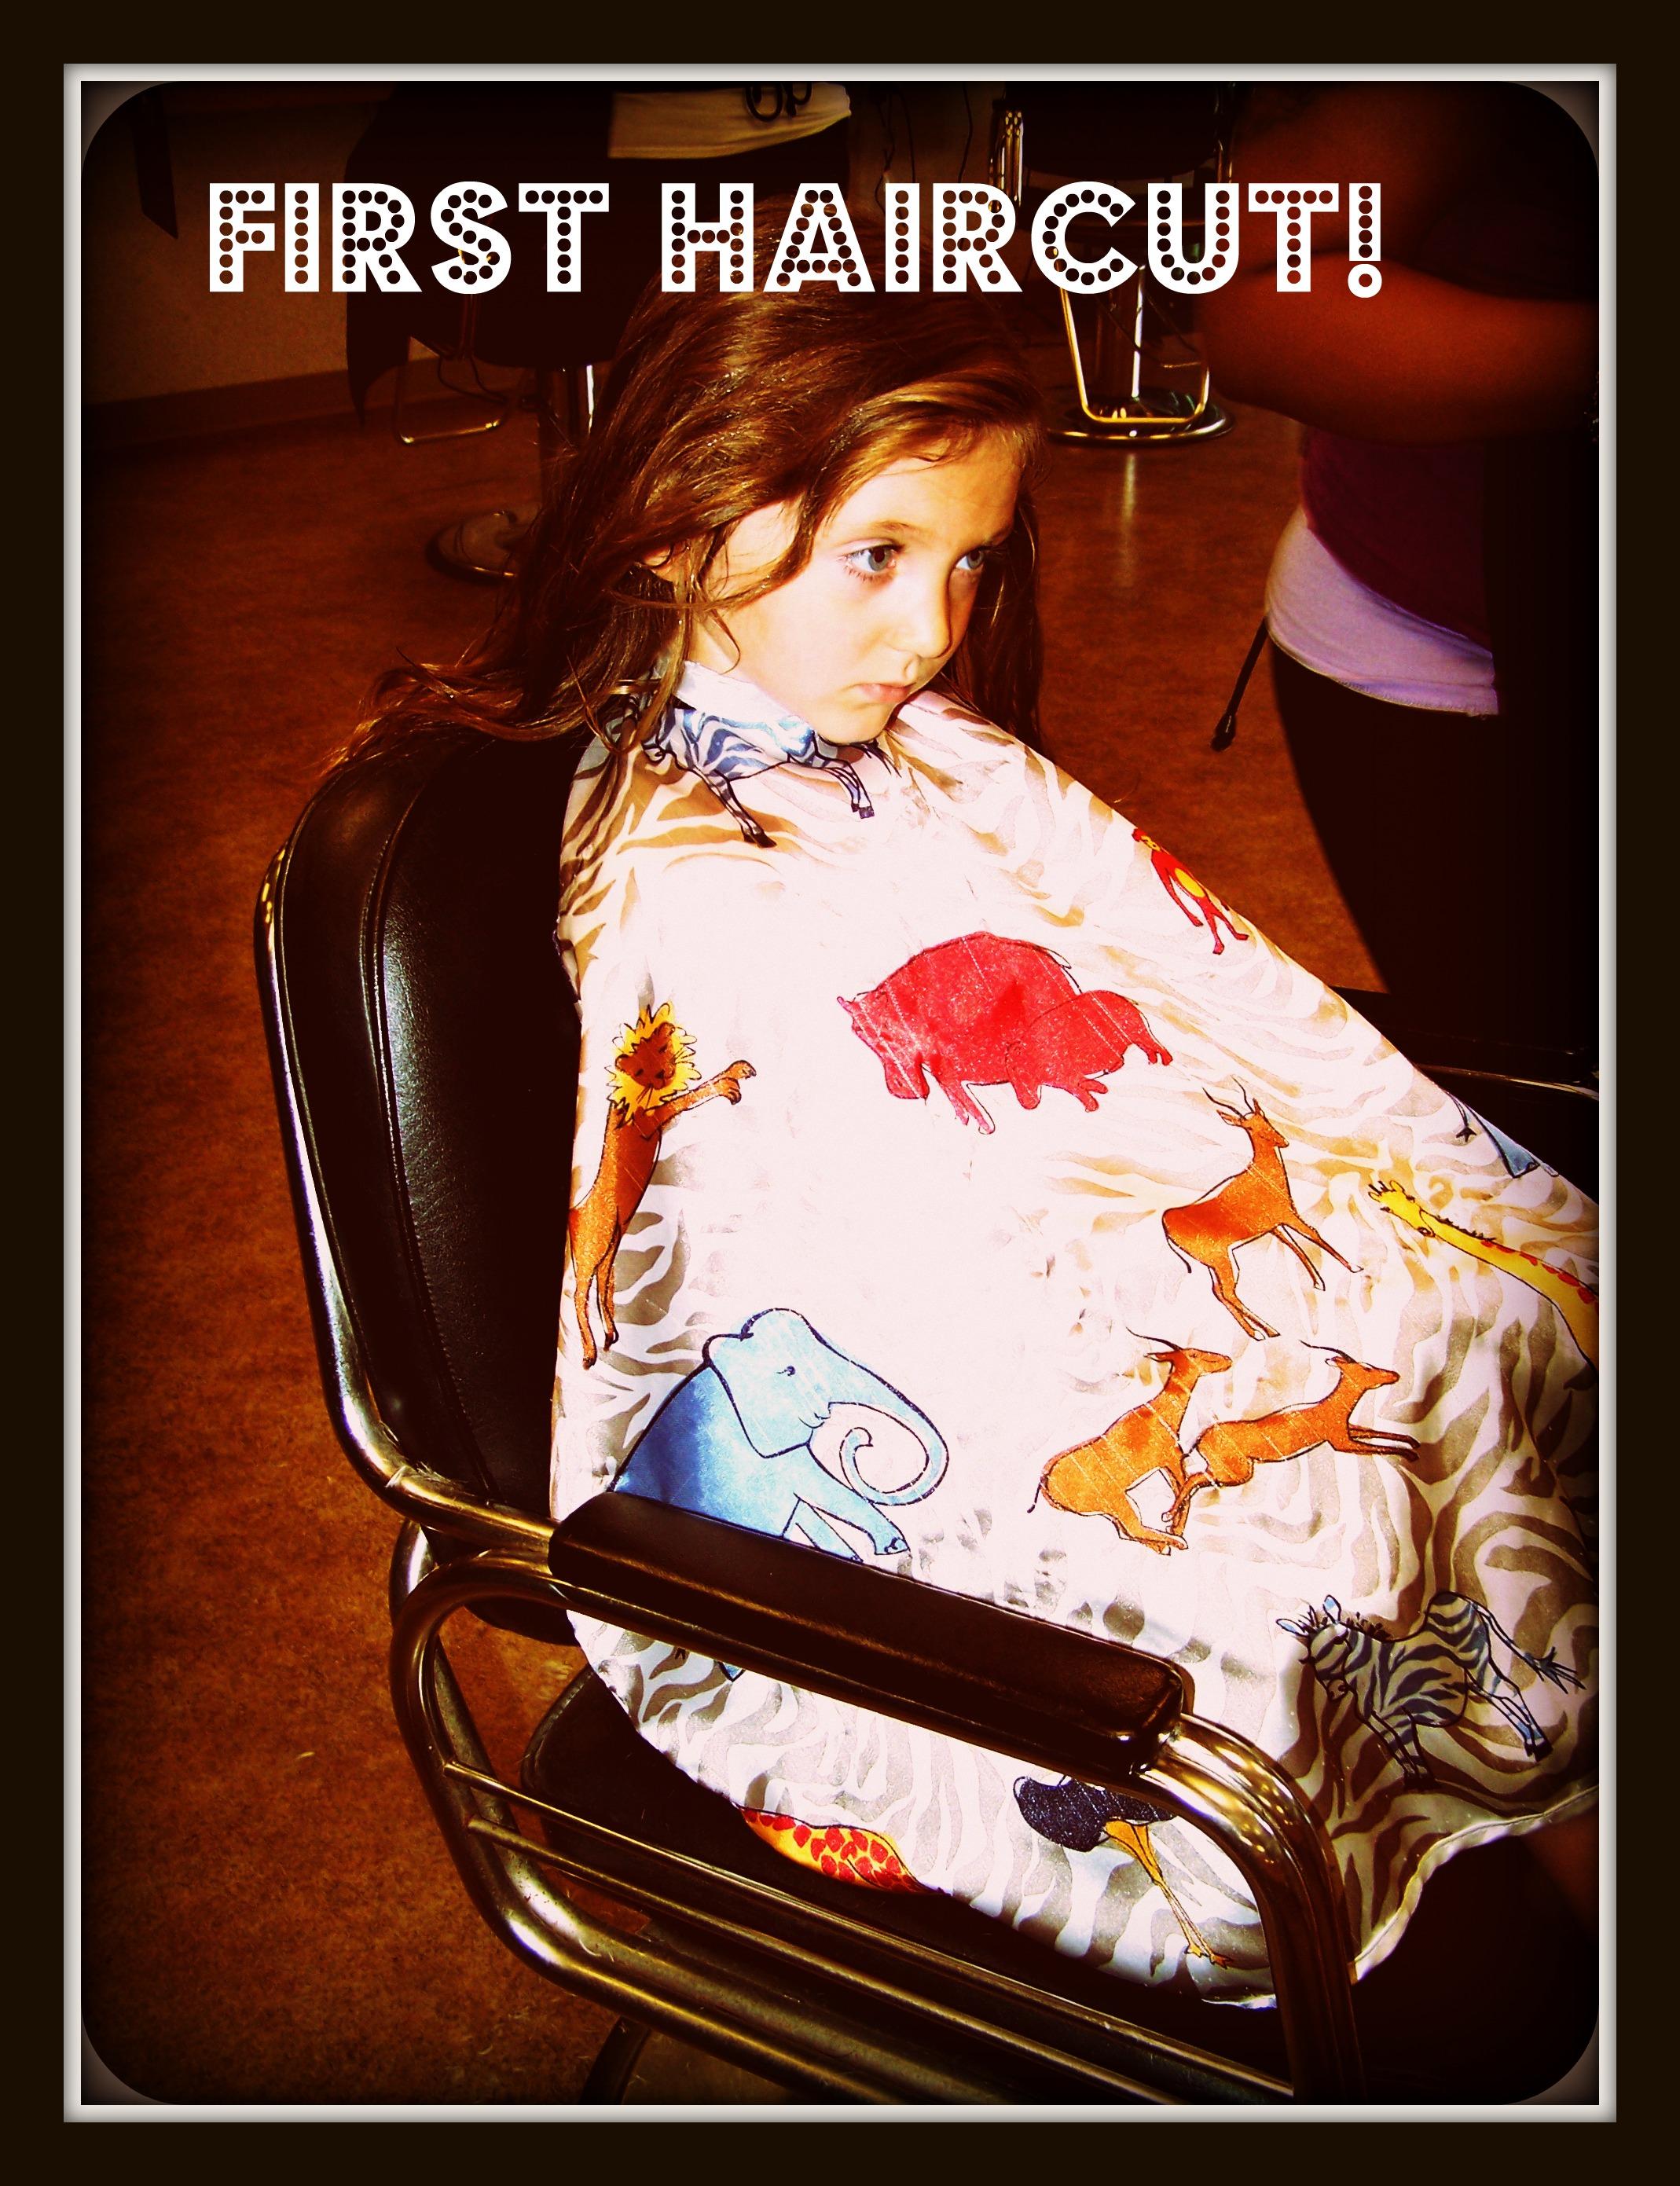 Haircut coupons toledo ohio - Haircut 014